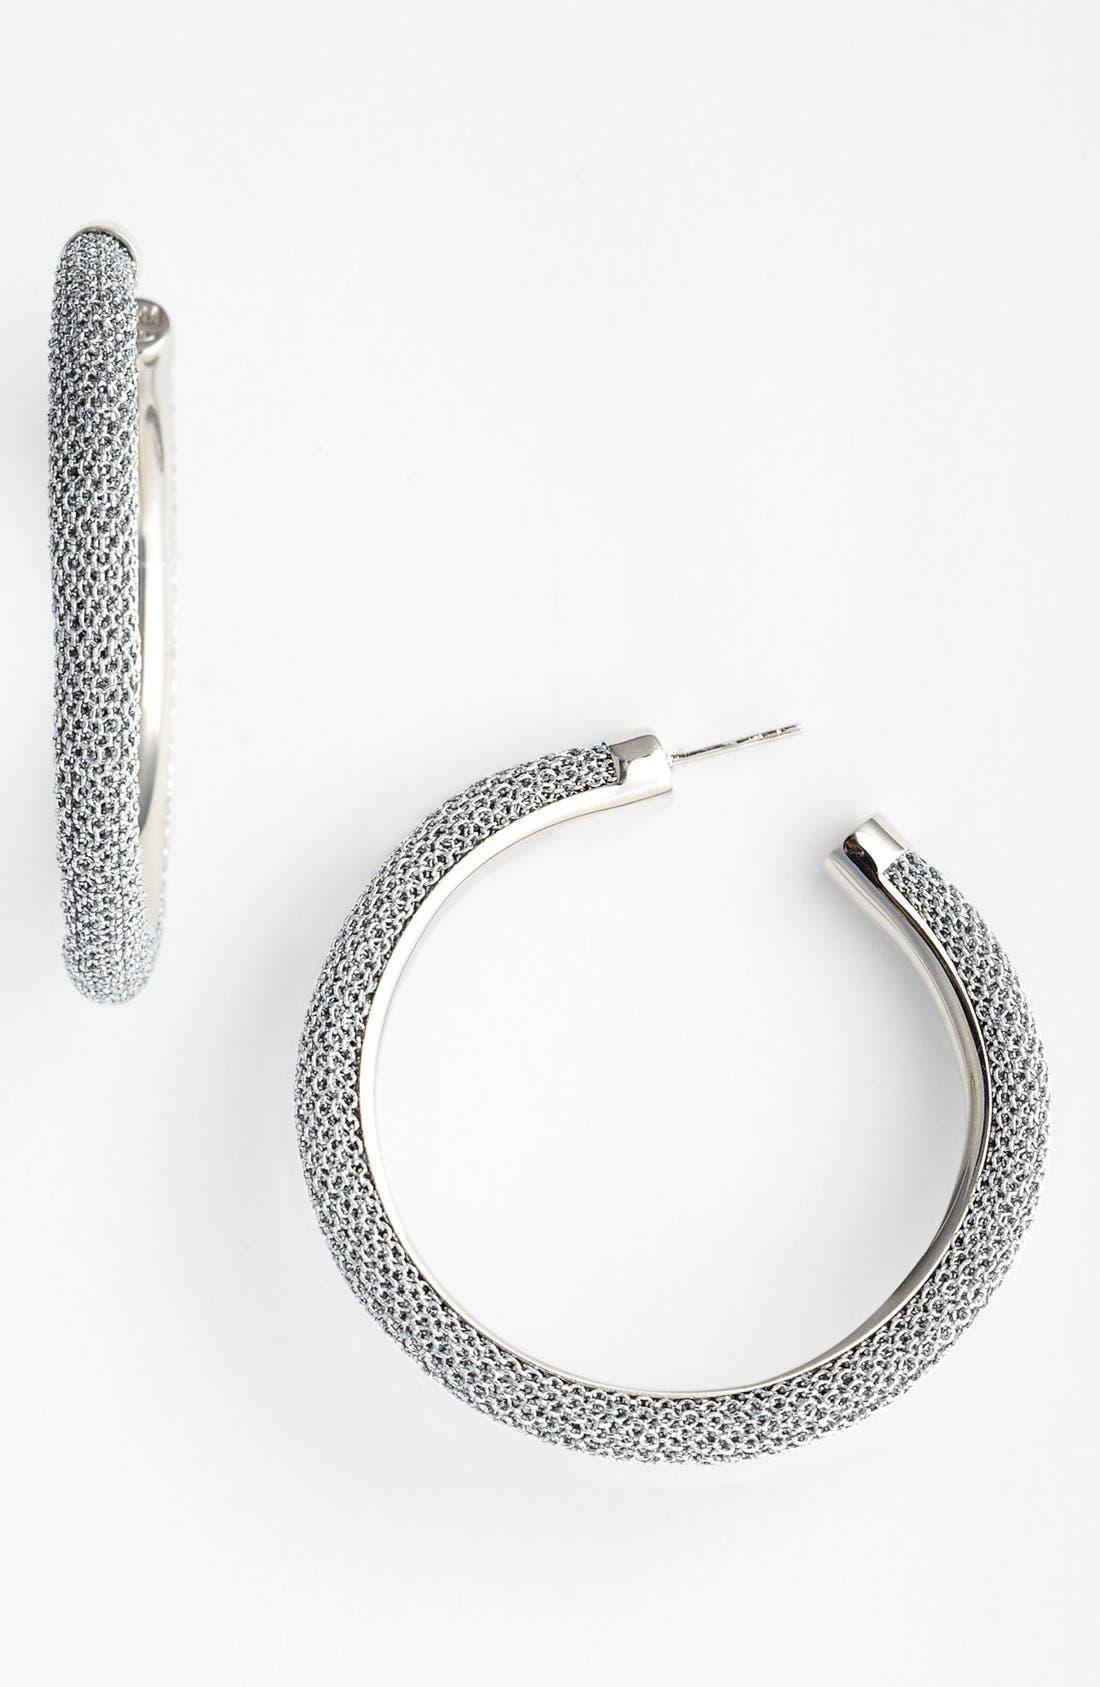 Main Image - Adami & Martucci 'Mesh' Large Hoop Earrings